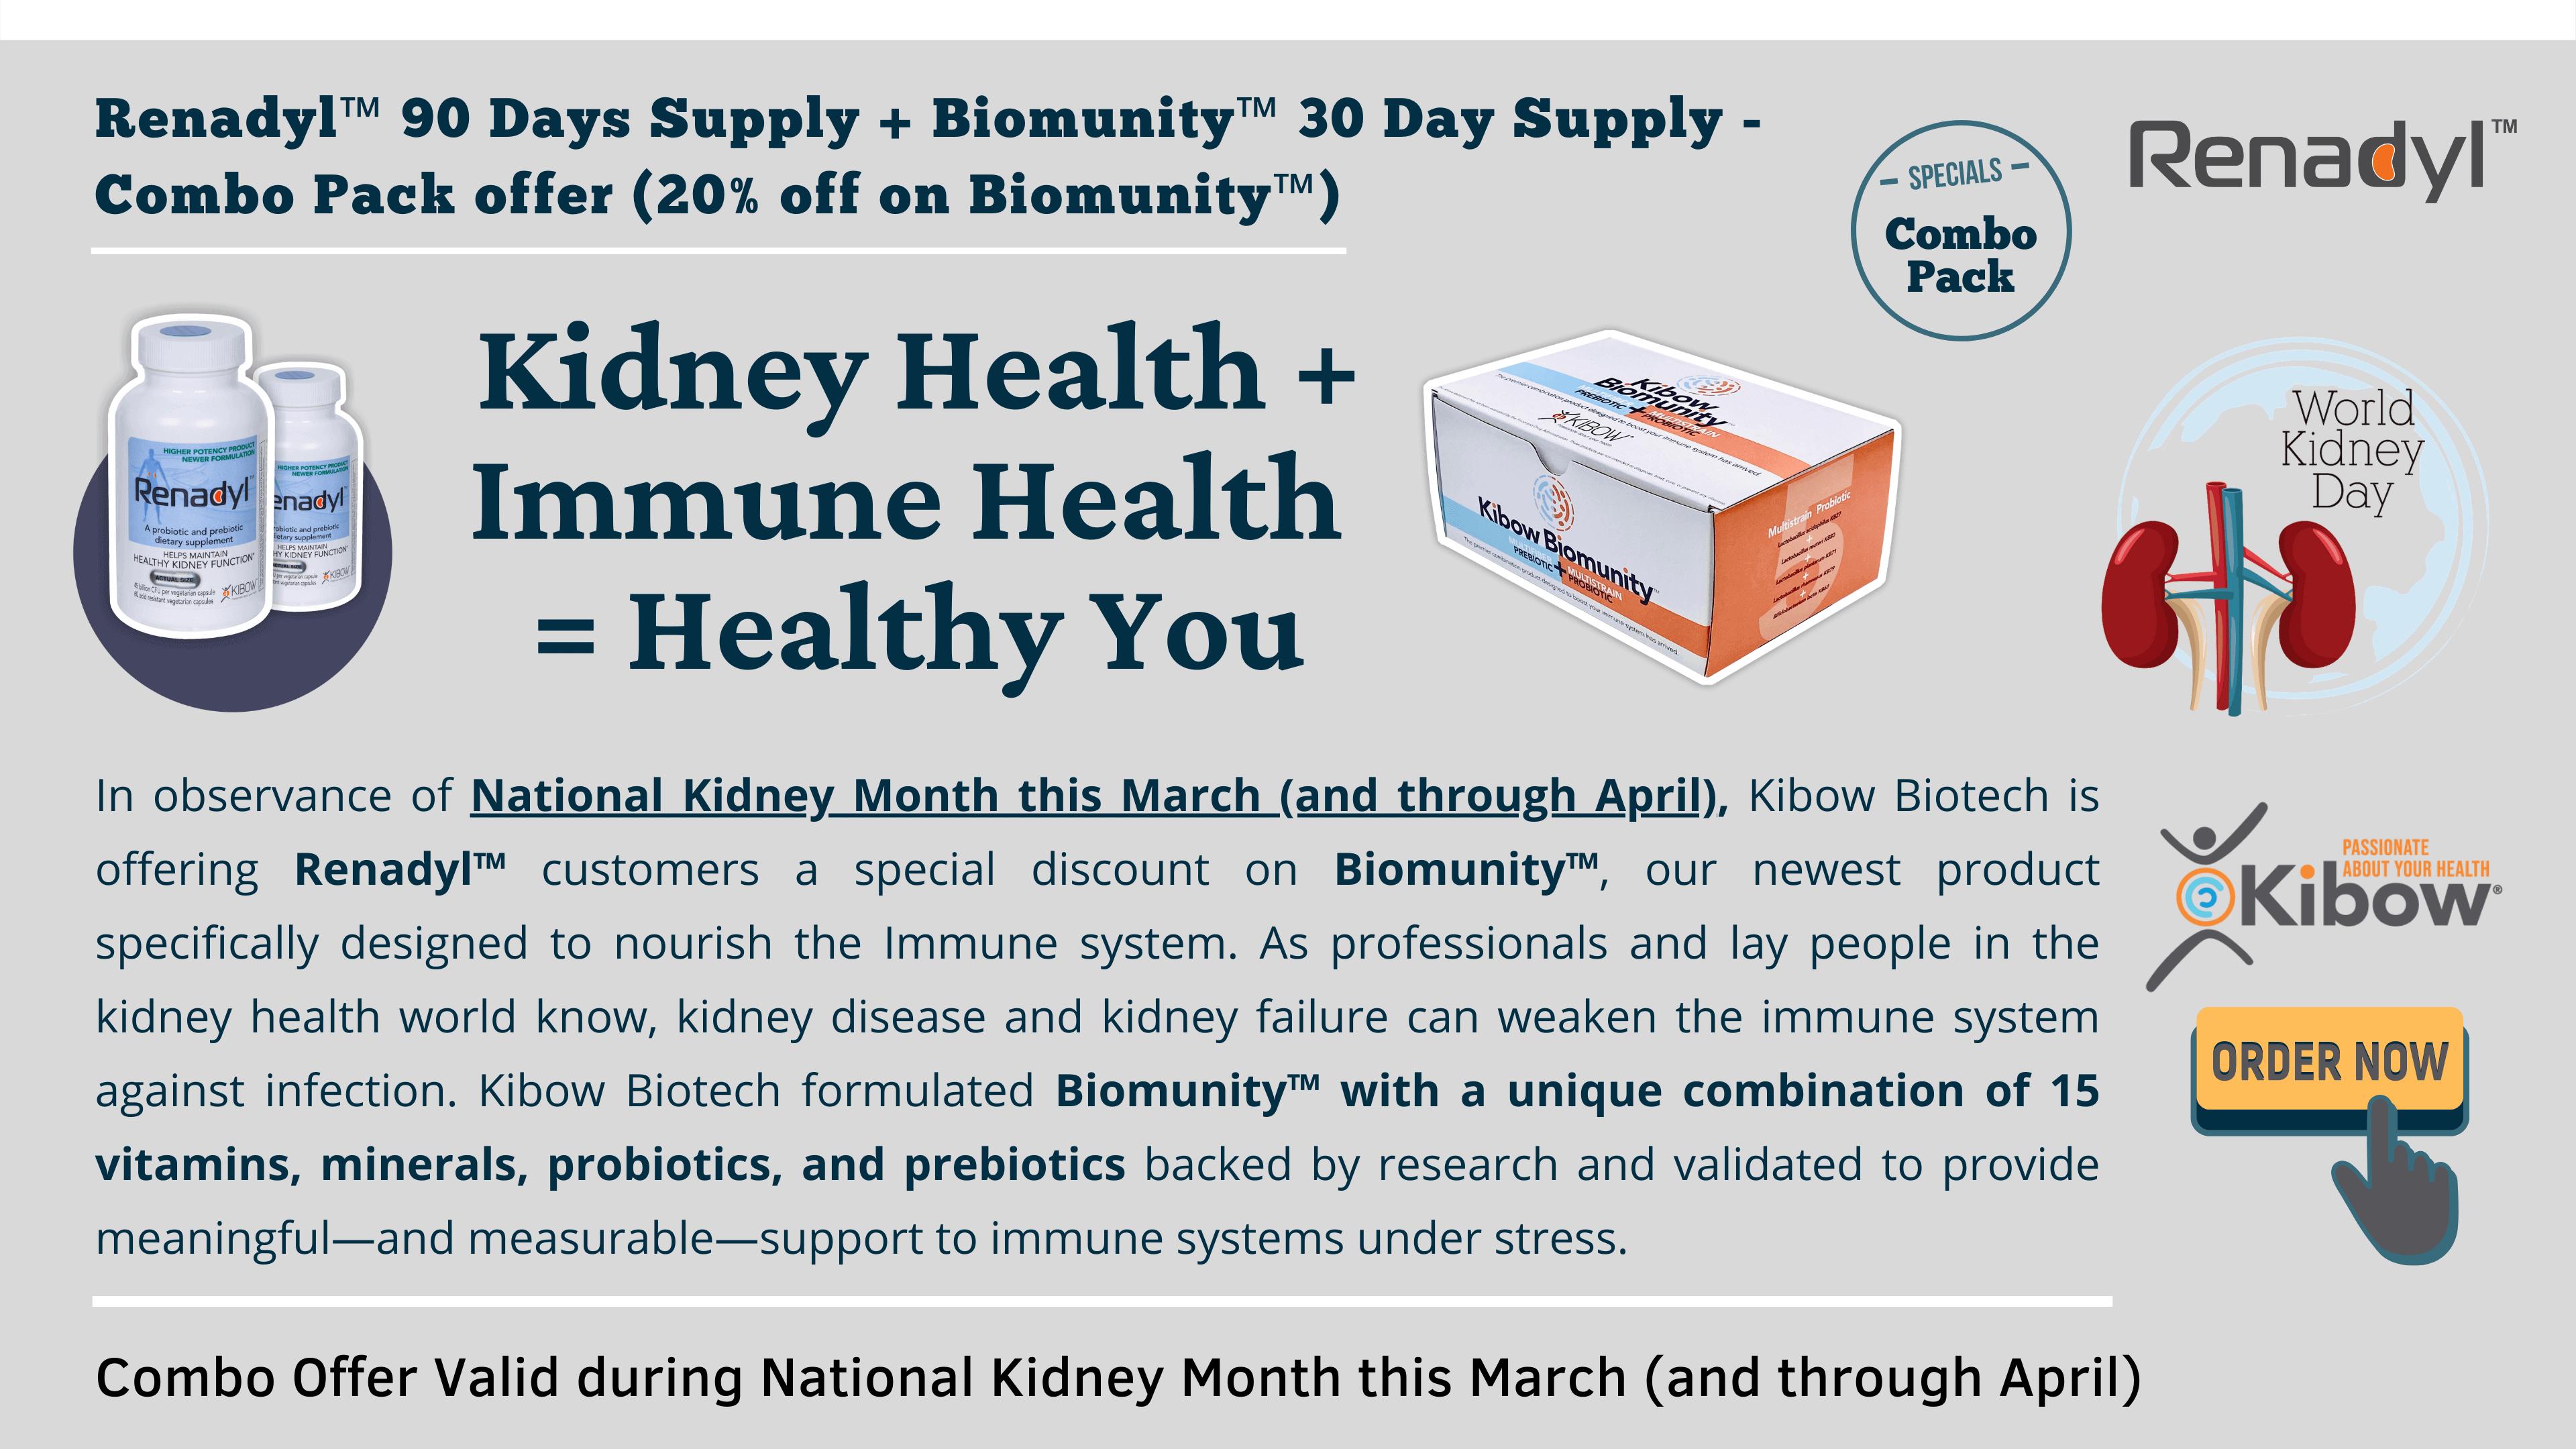 Renadyl -Biomunity - Immune health for Kidney patients